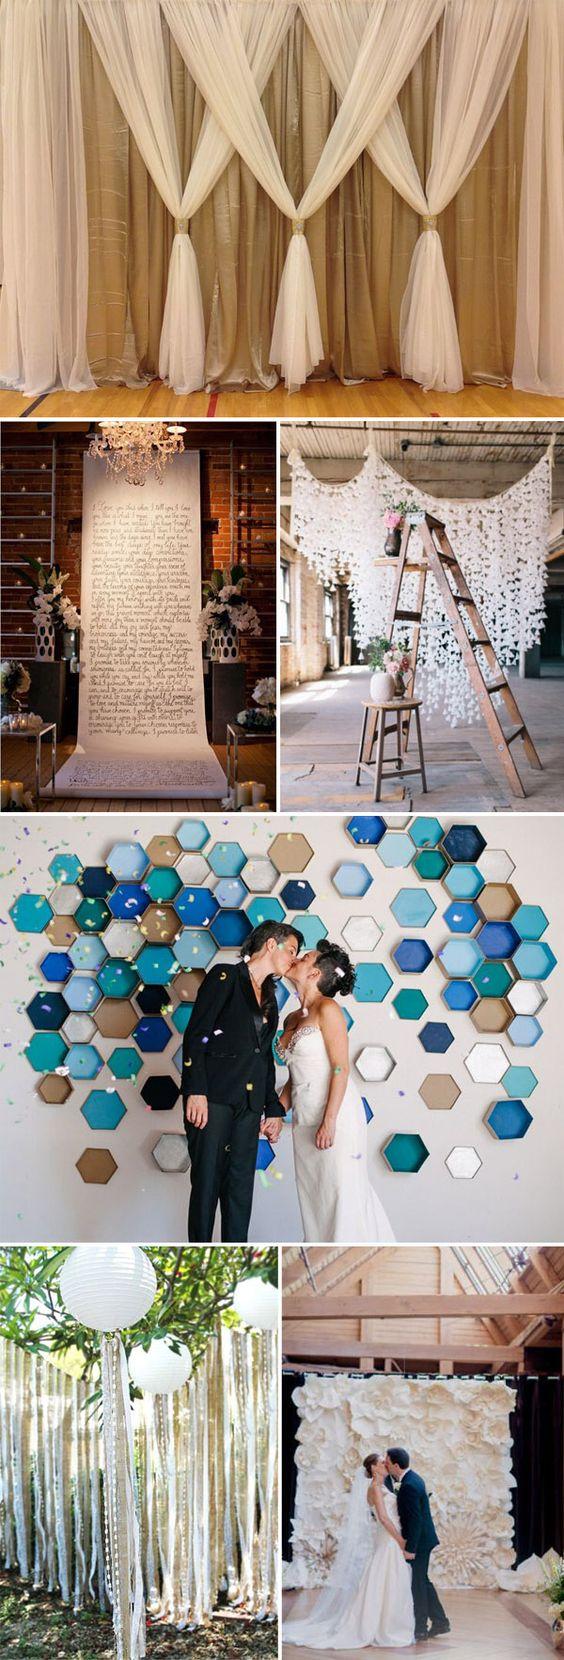 100 amazing wedding backdrop ideas backdrops pallets and weddings solutioingenieria Images